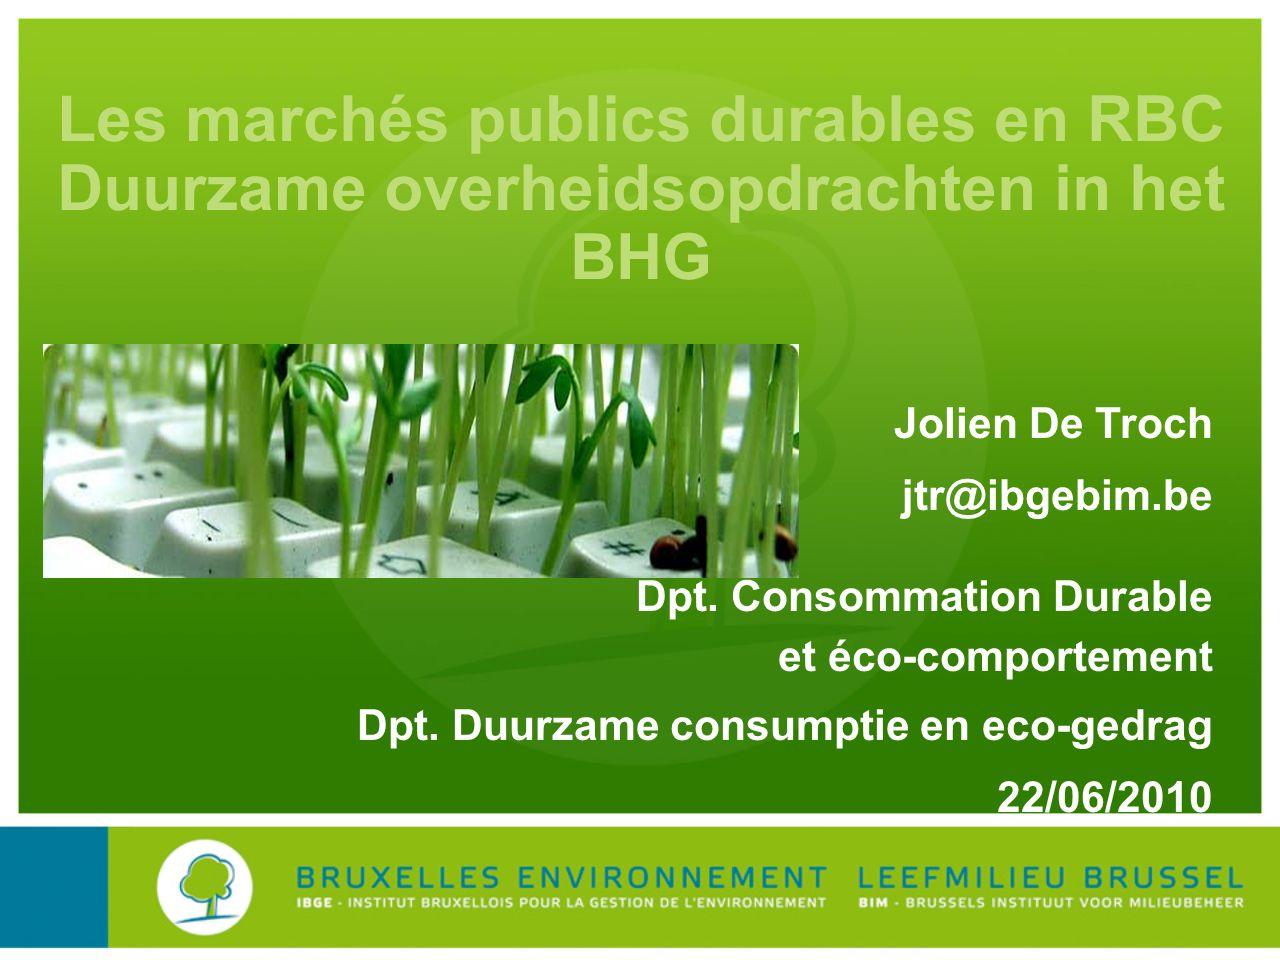 Les marchés publics durables en RBC Duurzame overheidsopdrachten in het BHG